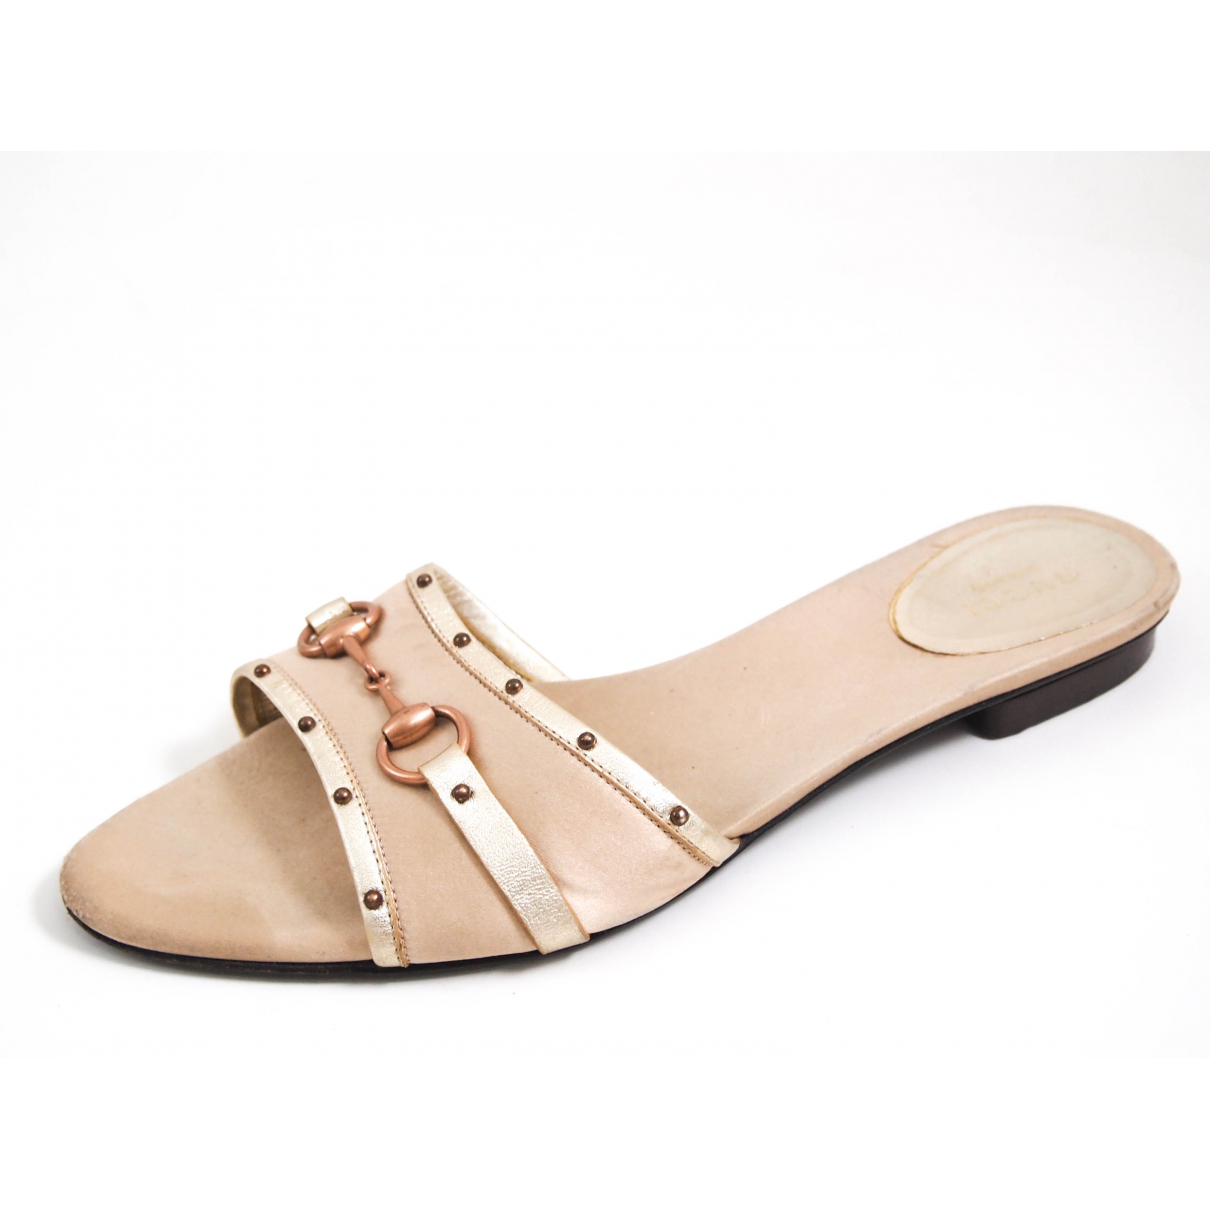 Gucci \N Sandalen in  Beige Leinen